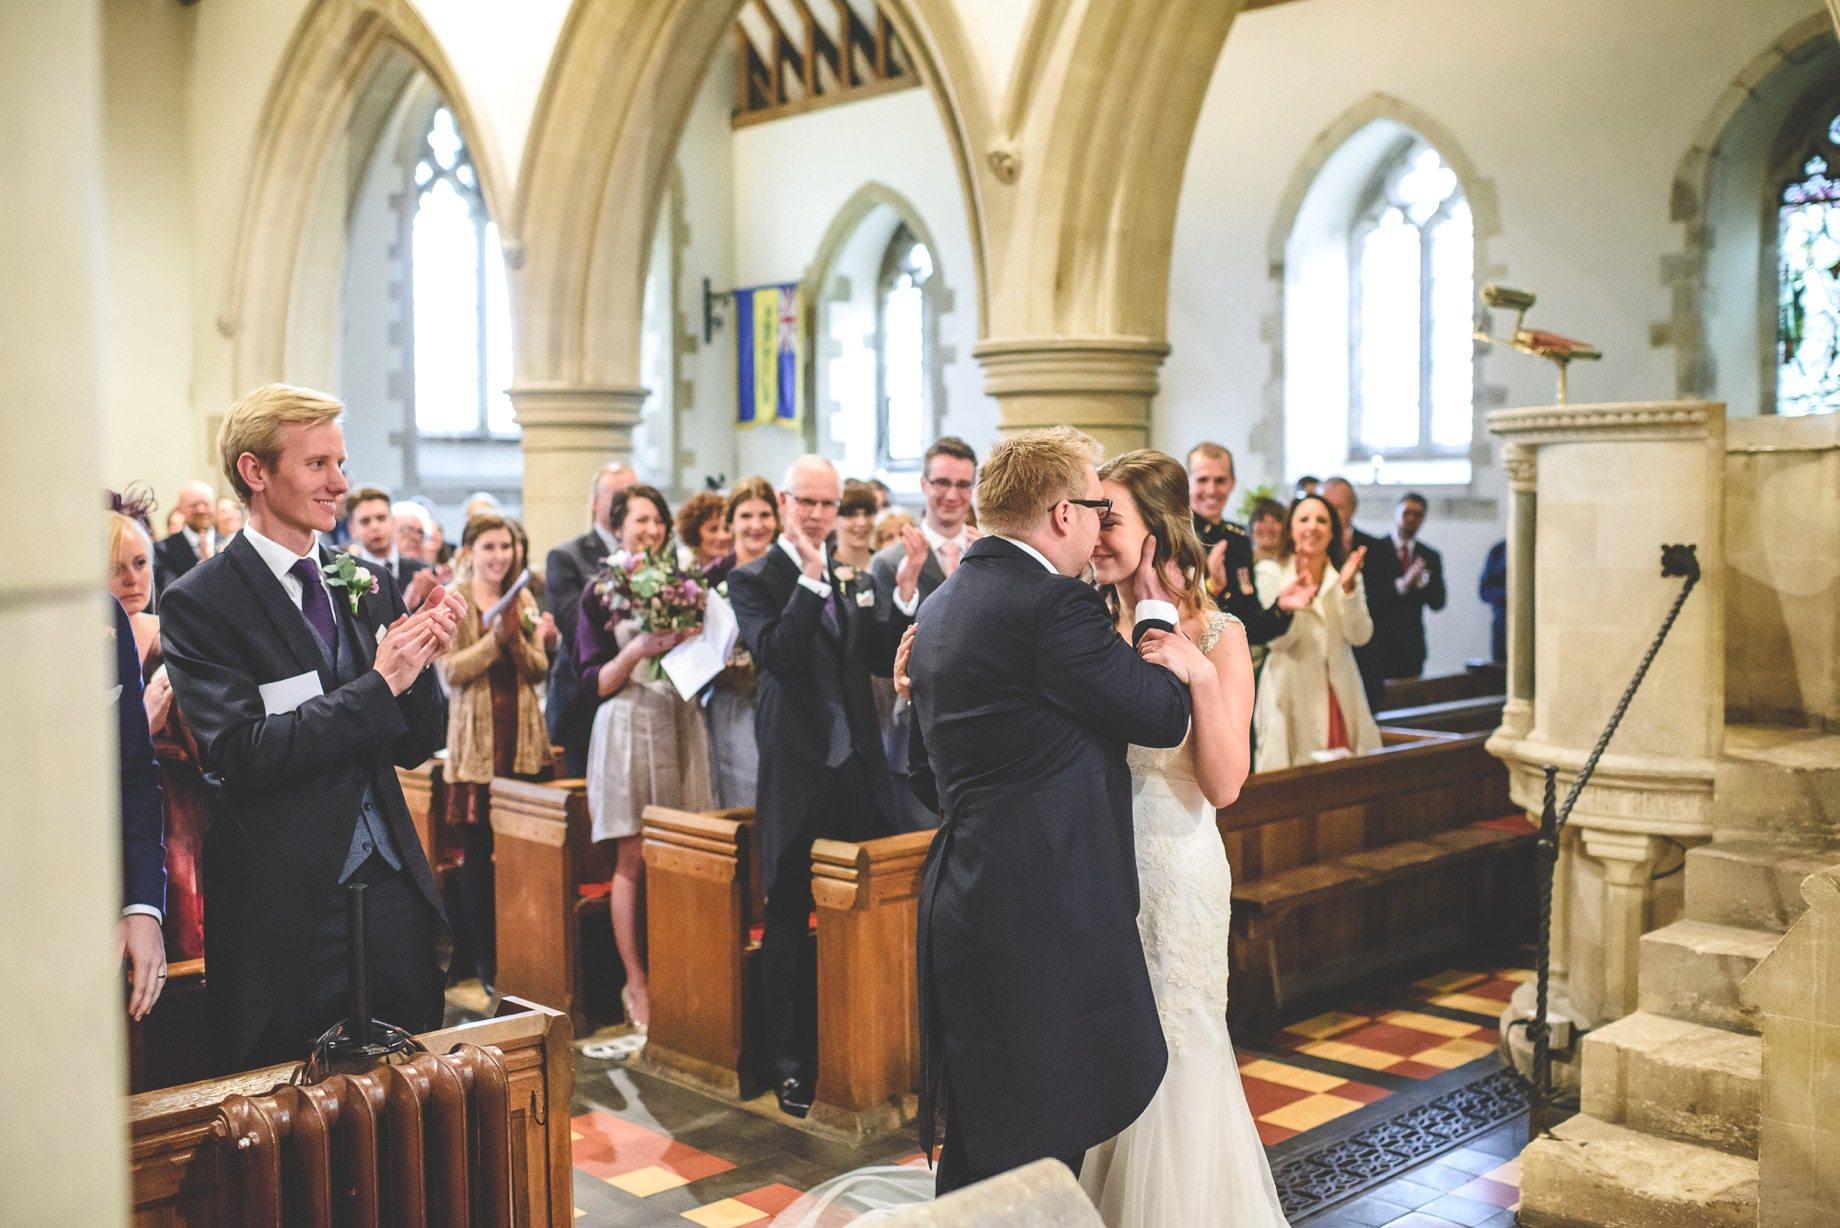 Heather and Chris - Hampshire wedding photography (73 of 174)